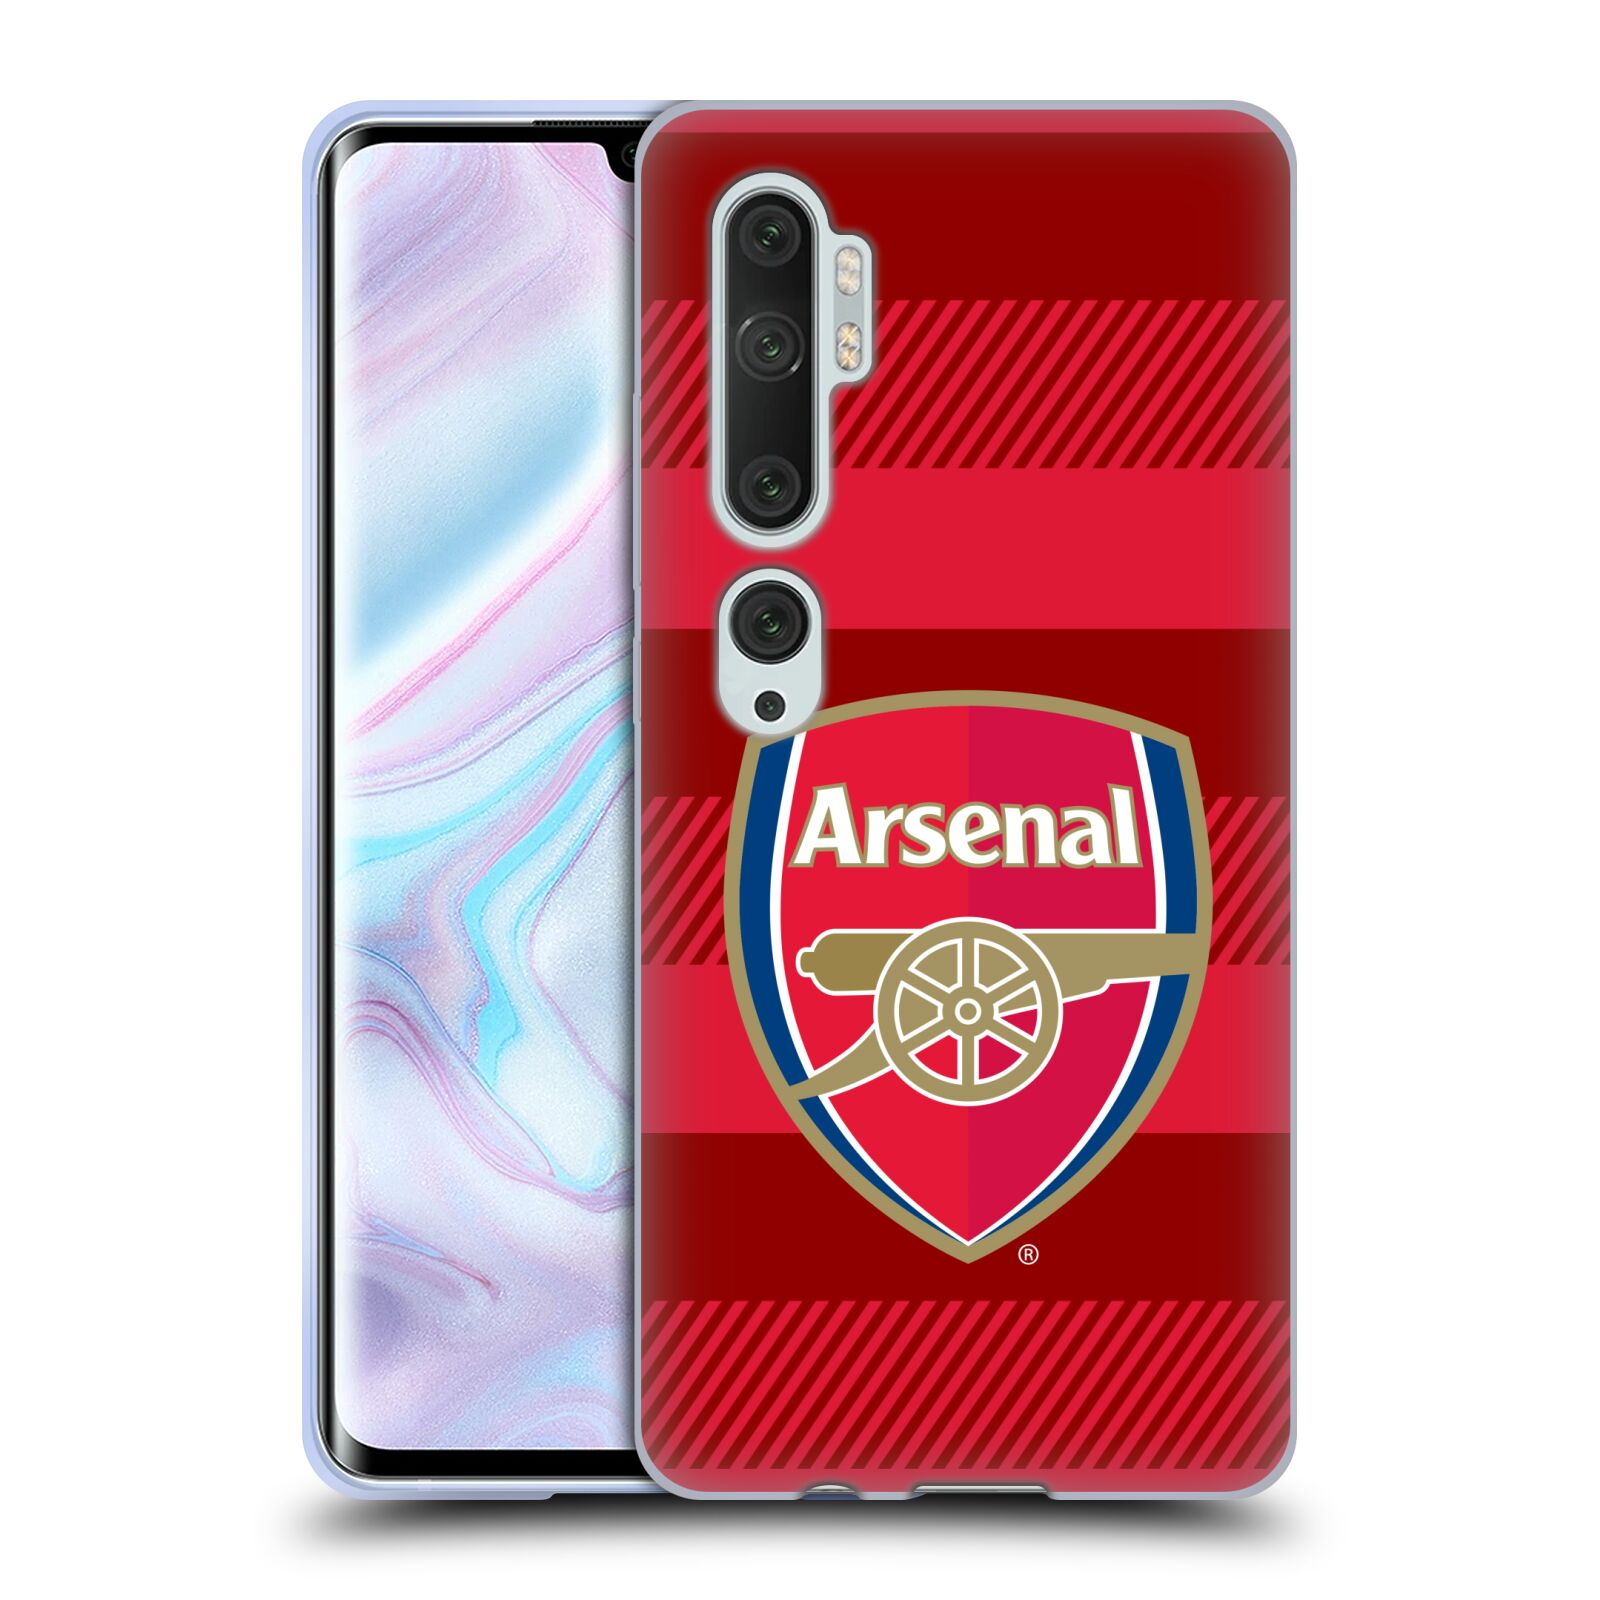 Silikonové pouzdro na mobil Xiaomi Mi Note 10 / 10 Pro - Head Case - Arsenal FC - Logo s pruhy